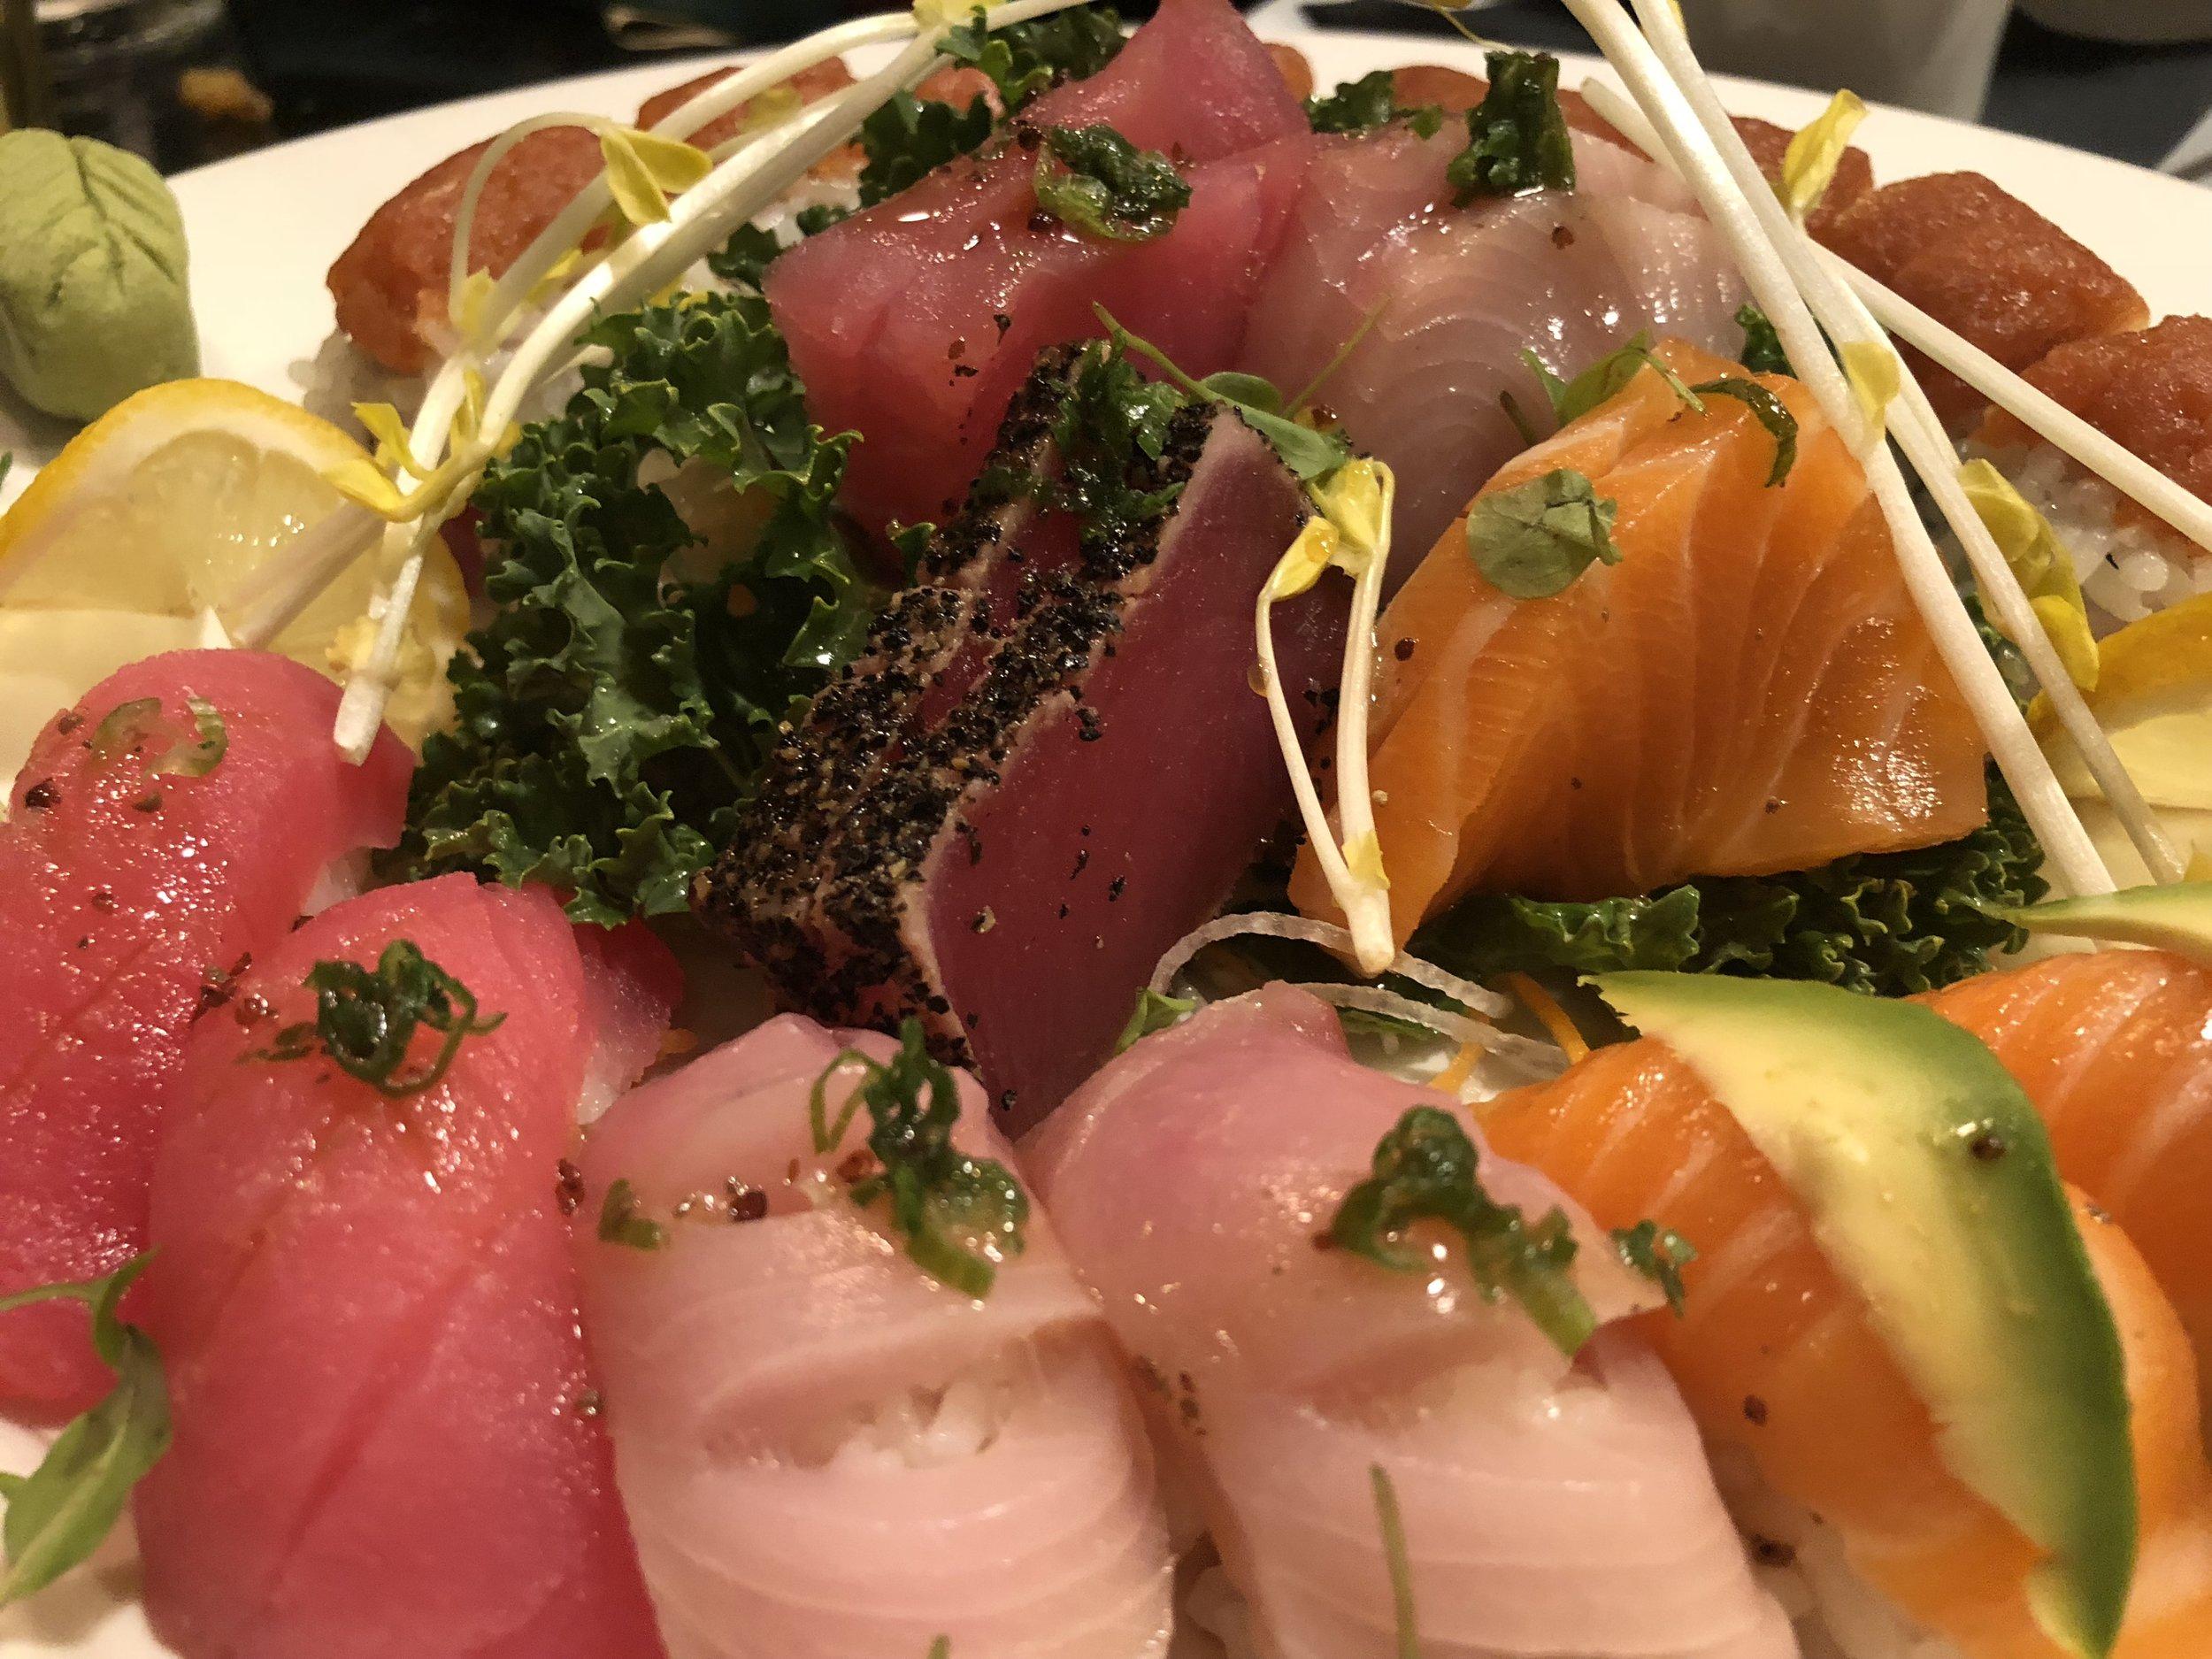 Cedar-Park-sushi-food-near-me (1).jpg